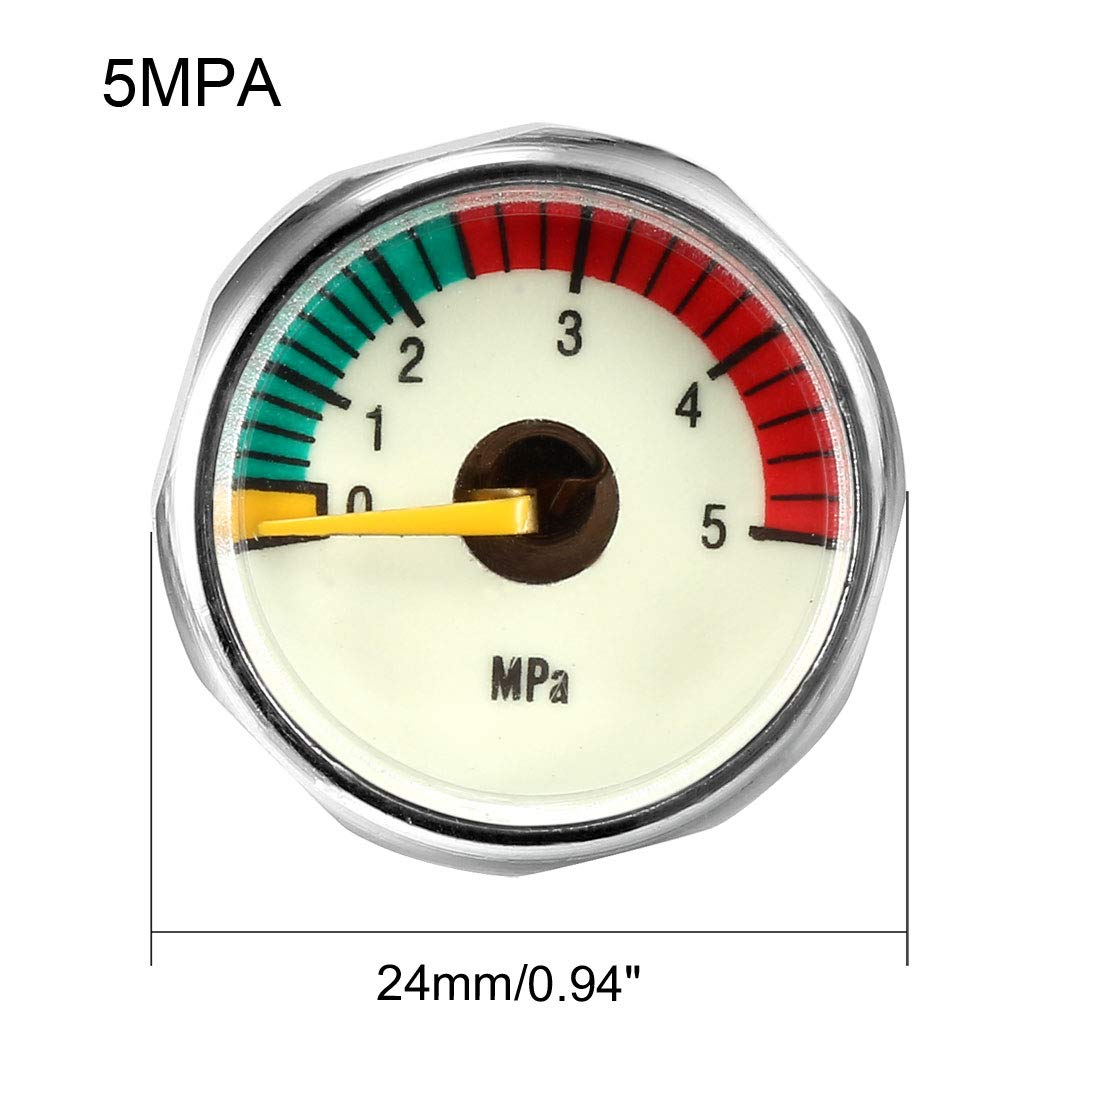 uxcell Diving Pressure Gauge 30MPA M8 Luminous Pony Bottle High Pressure Mini Manometer Universal Gauges for Scuba Diving